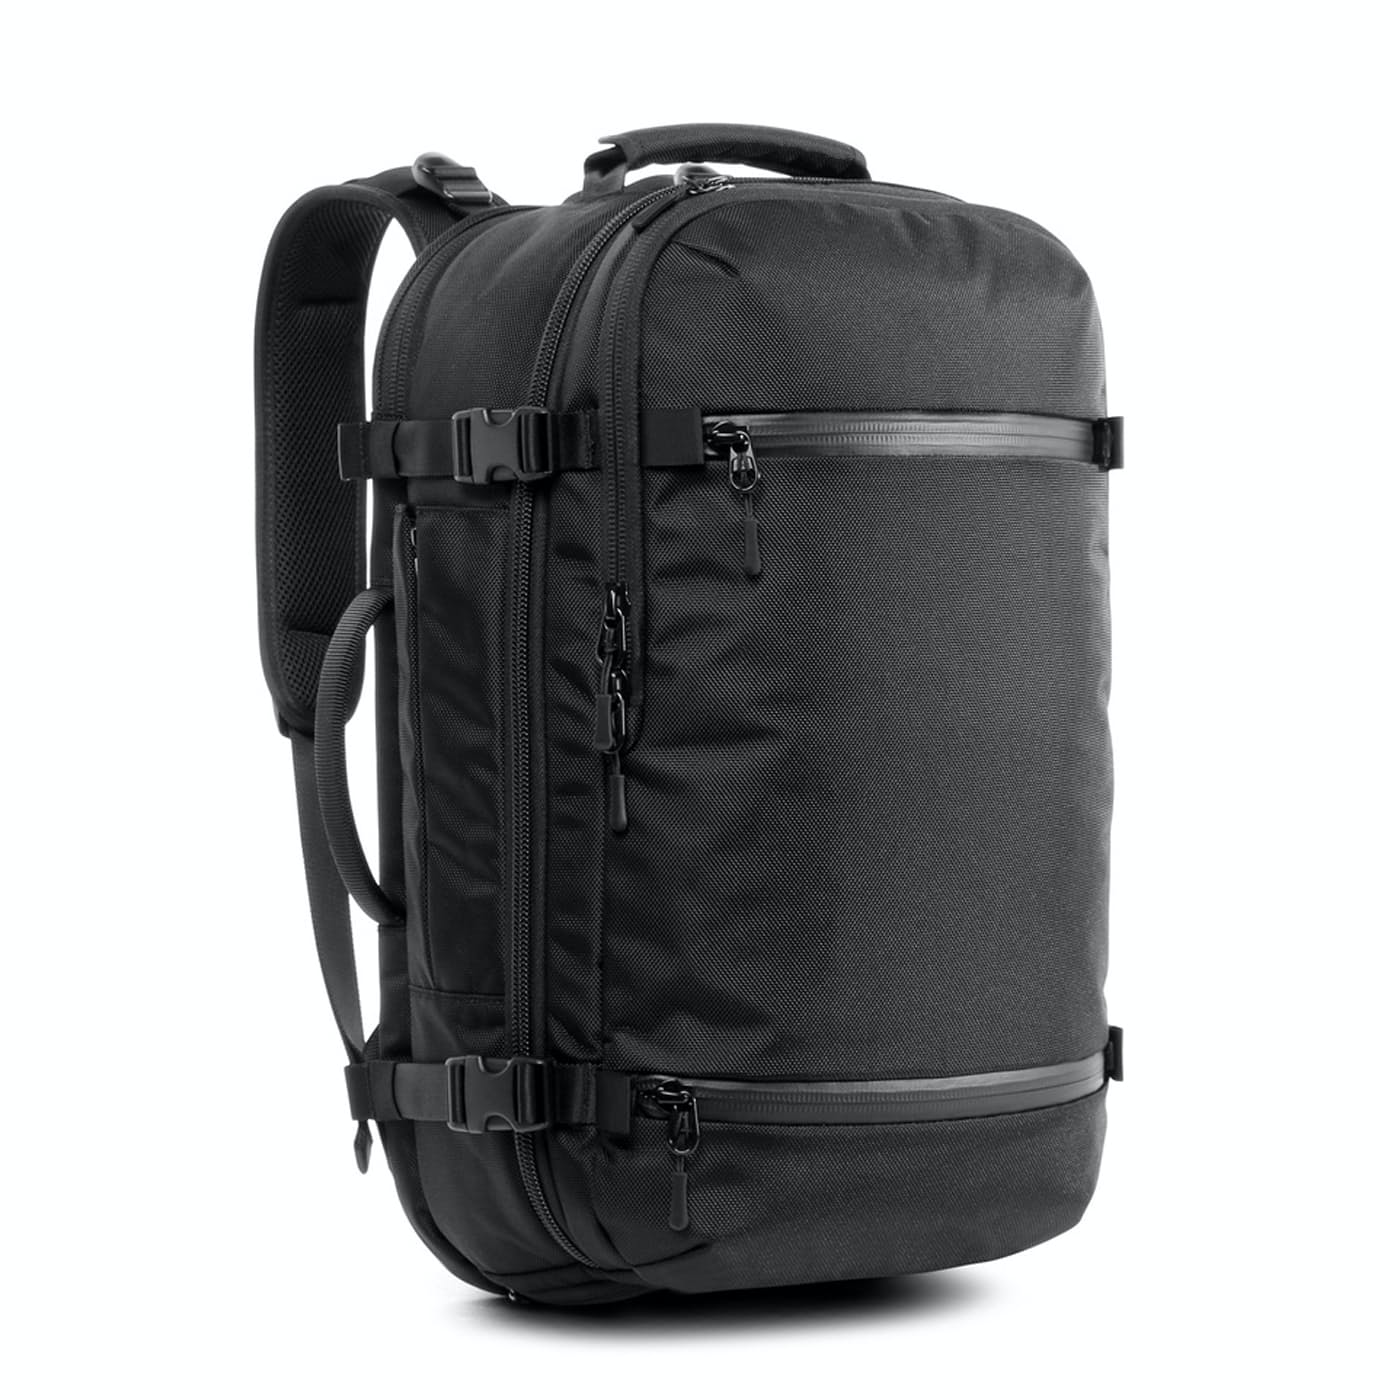 Ragyhc63lz aer travel pack 0 original